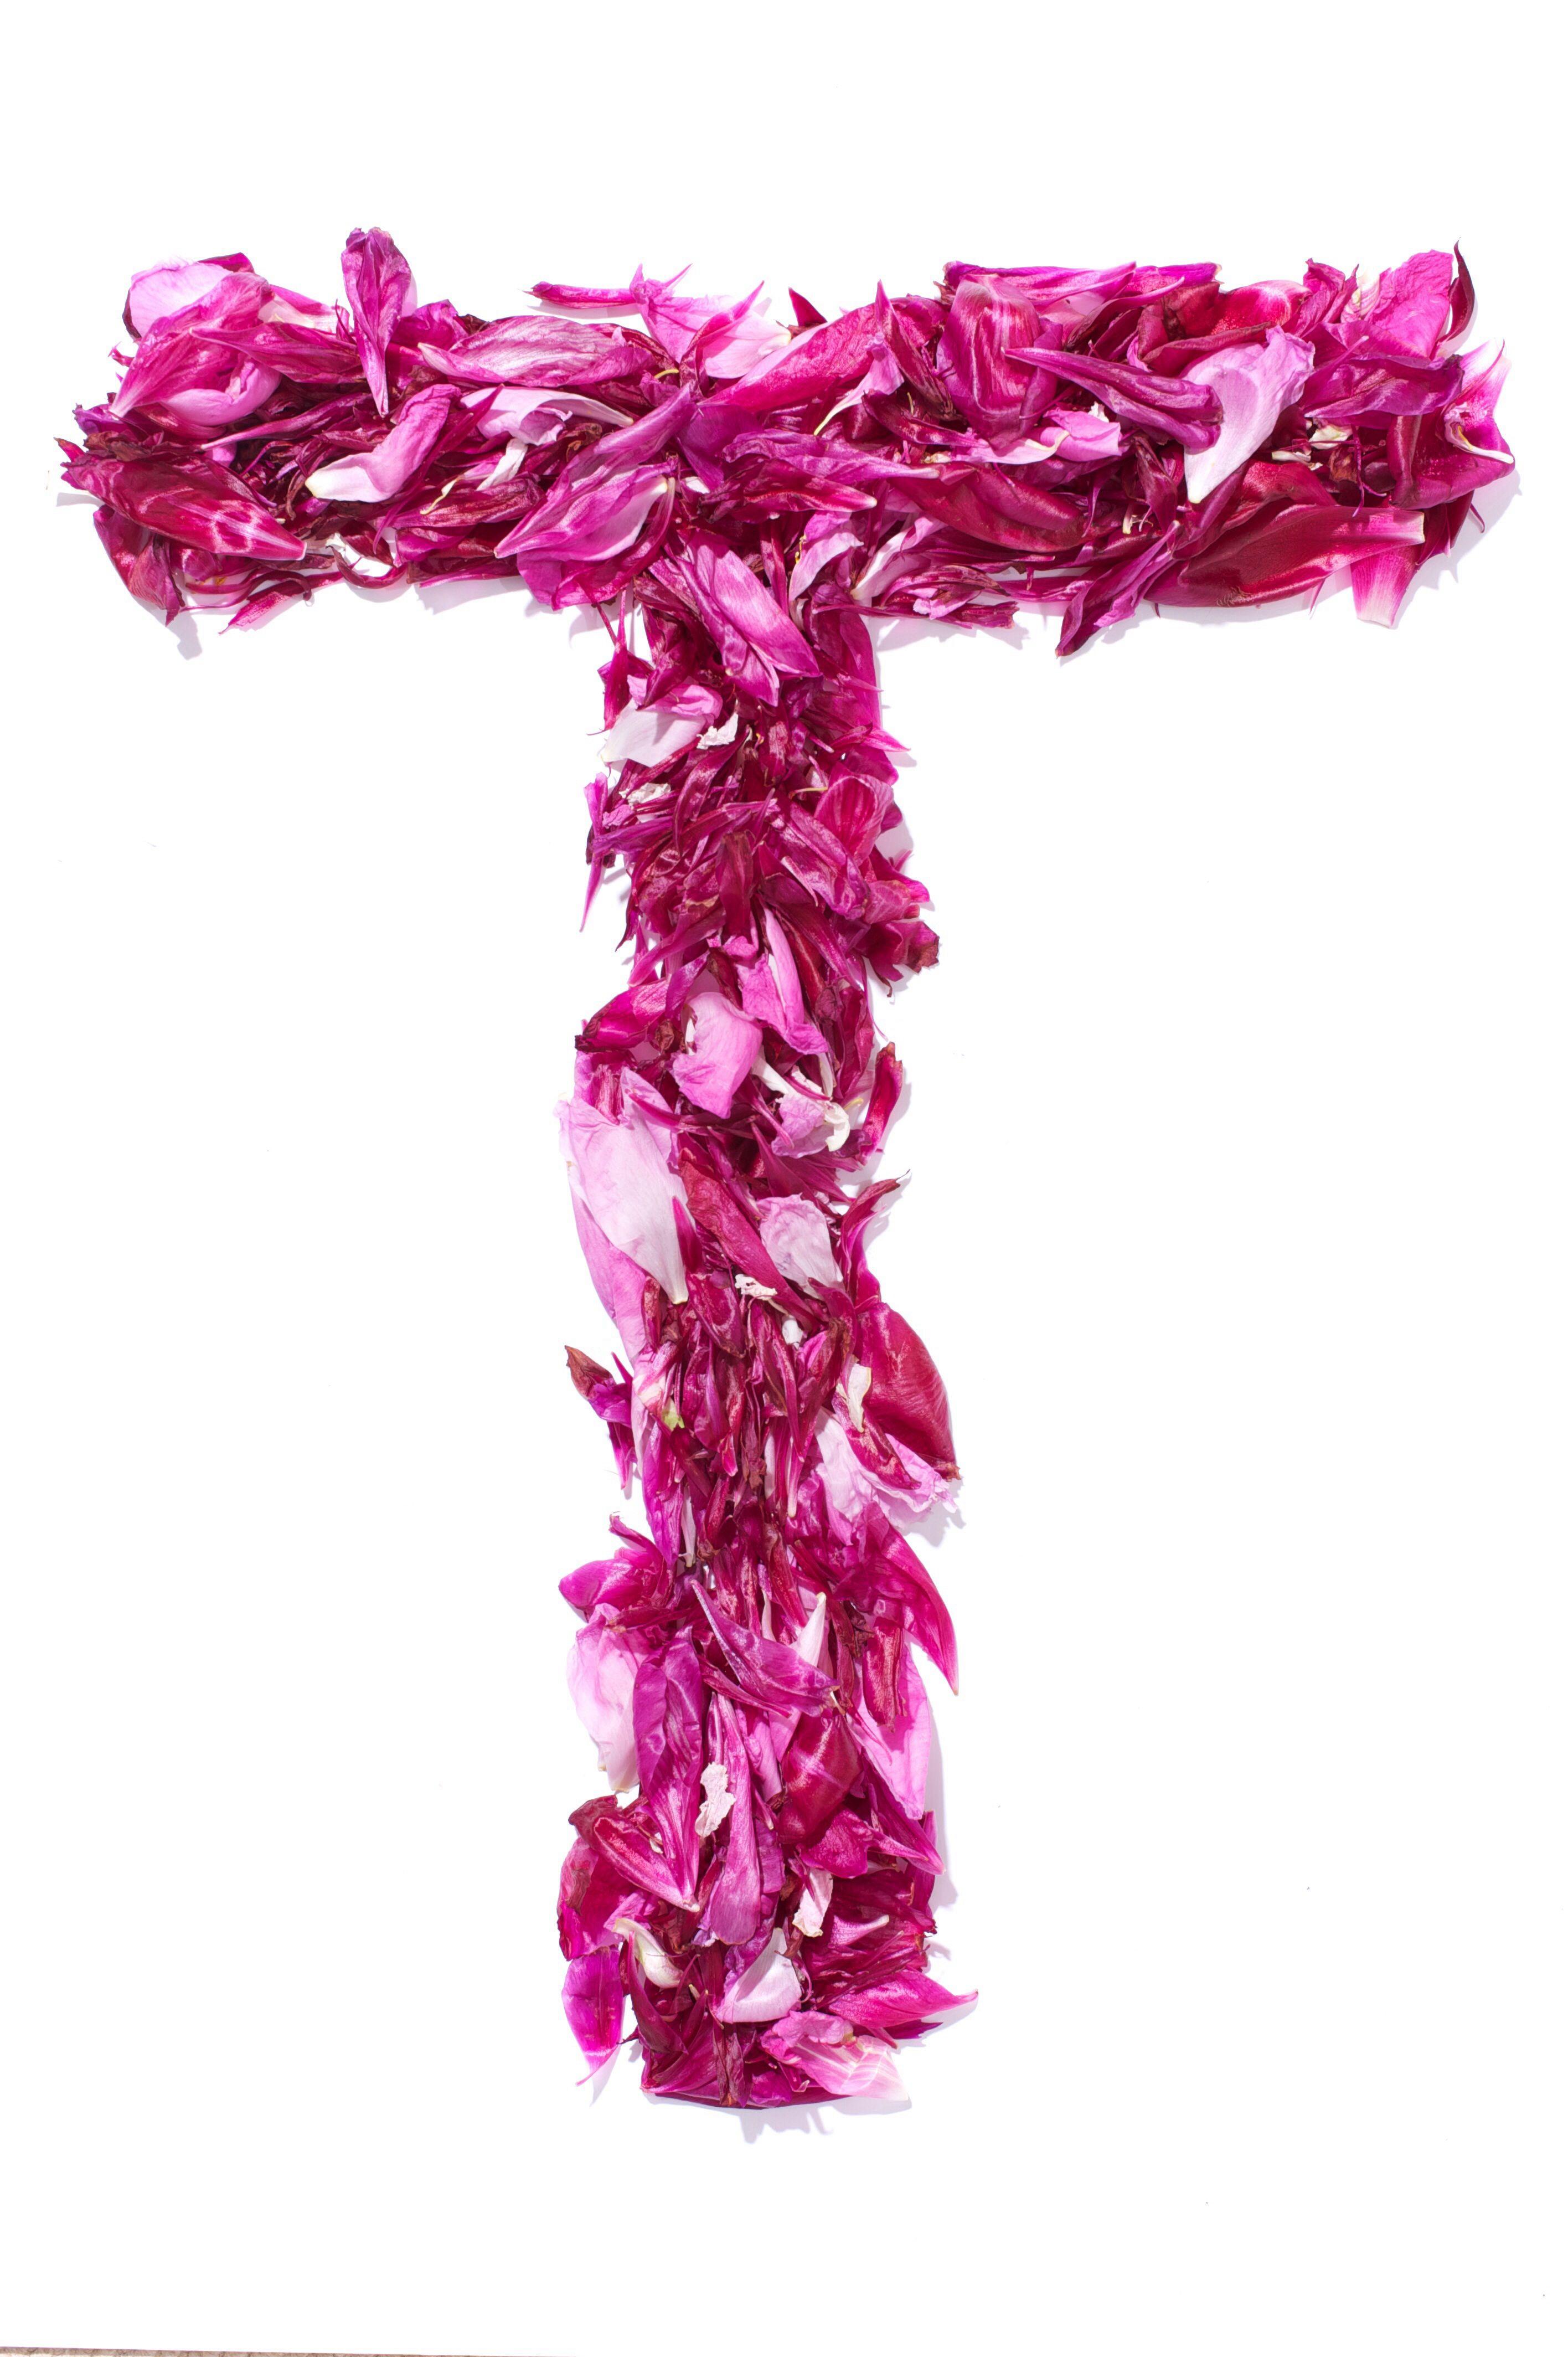 Pin By Thalyta Ellen On Alphabet Flower Alphabet Rose Frame Flowers